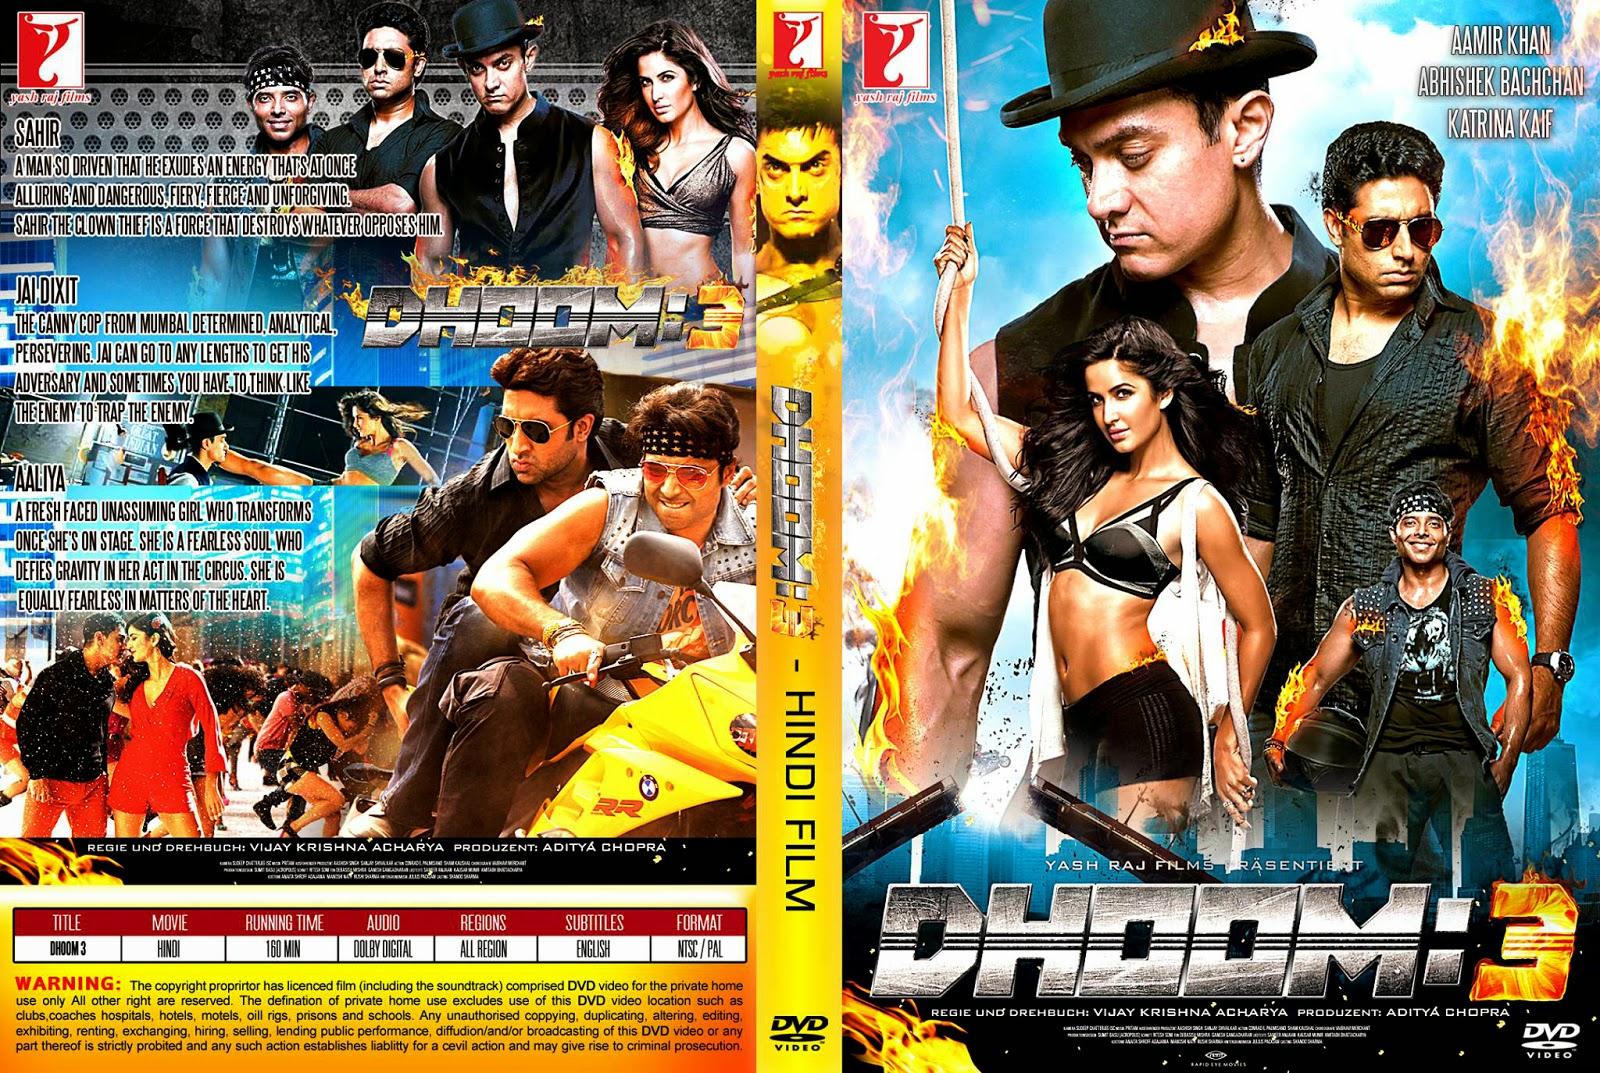 dhoom 3 (2013) hindi movie dvdrip 700mb download - hitsong4all